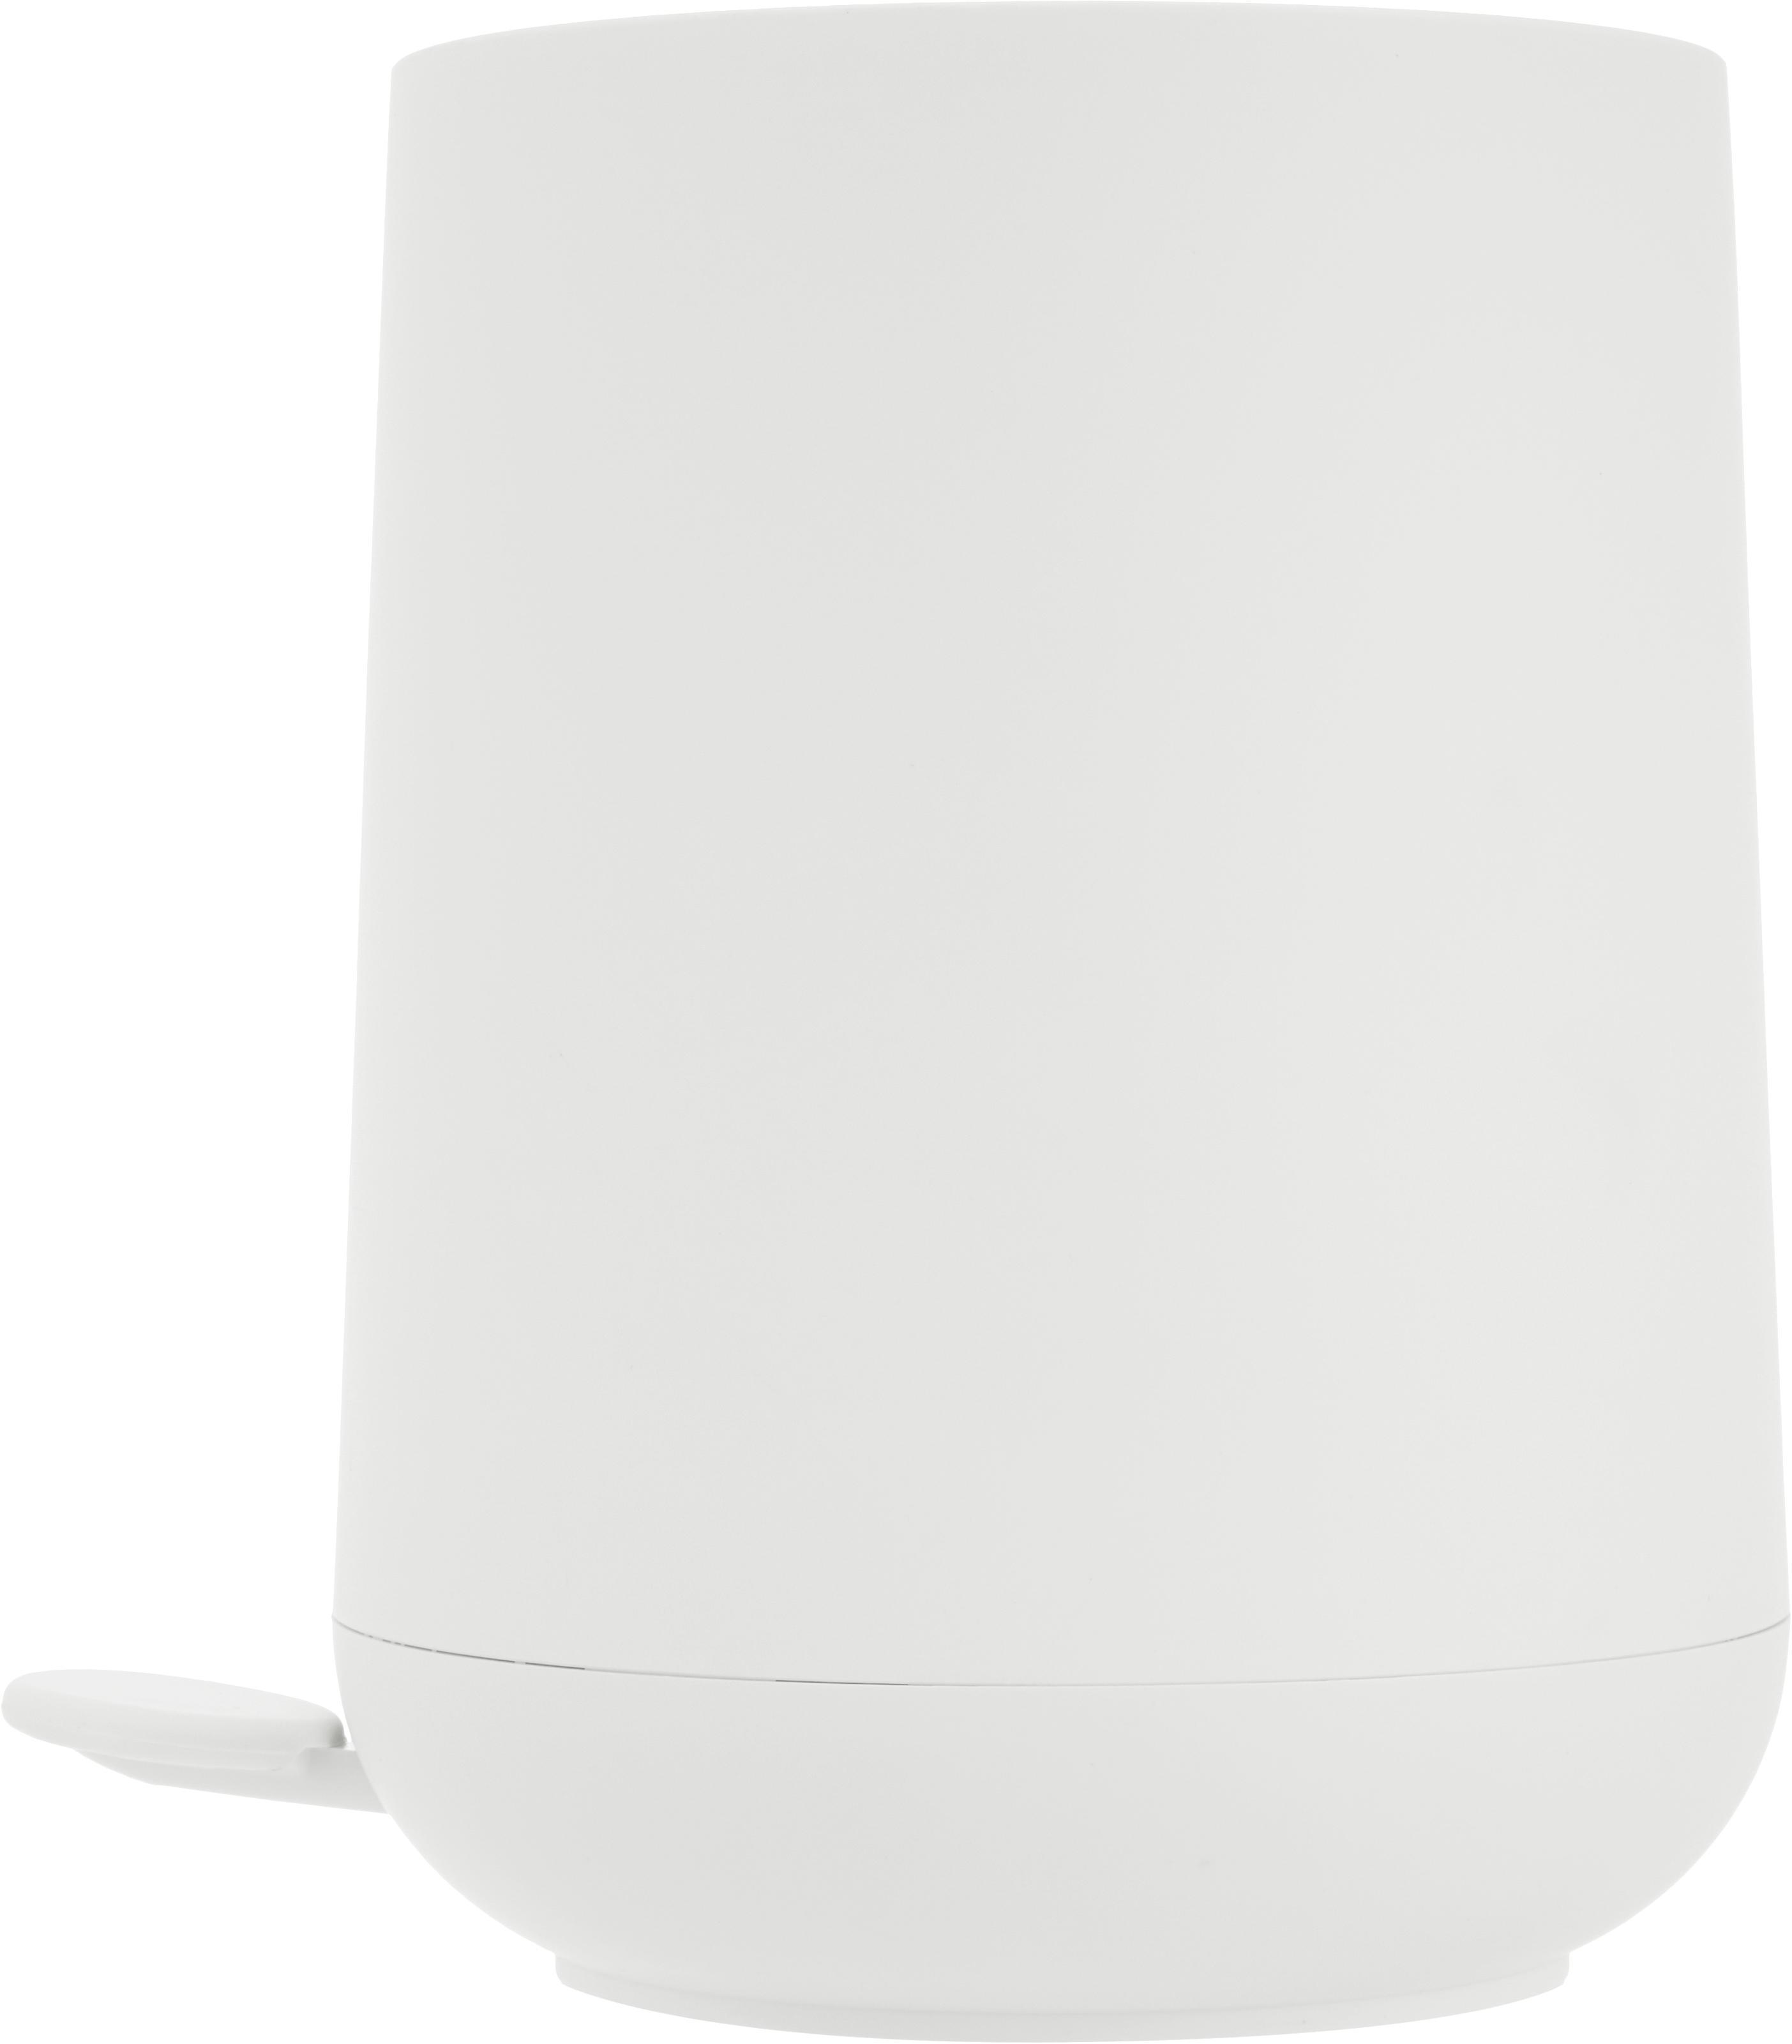 Pattumiera Nova, Materiale sintetico ABS, Bianco, Ø 23 x A 29 cm